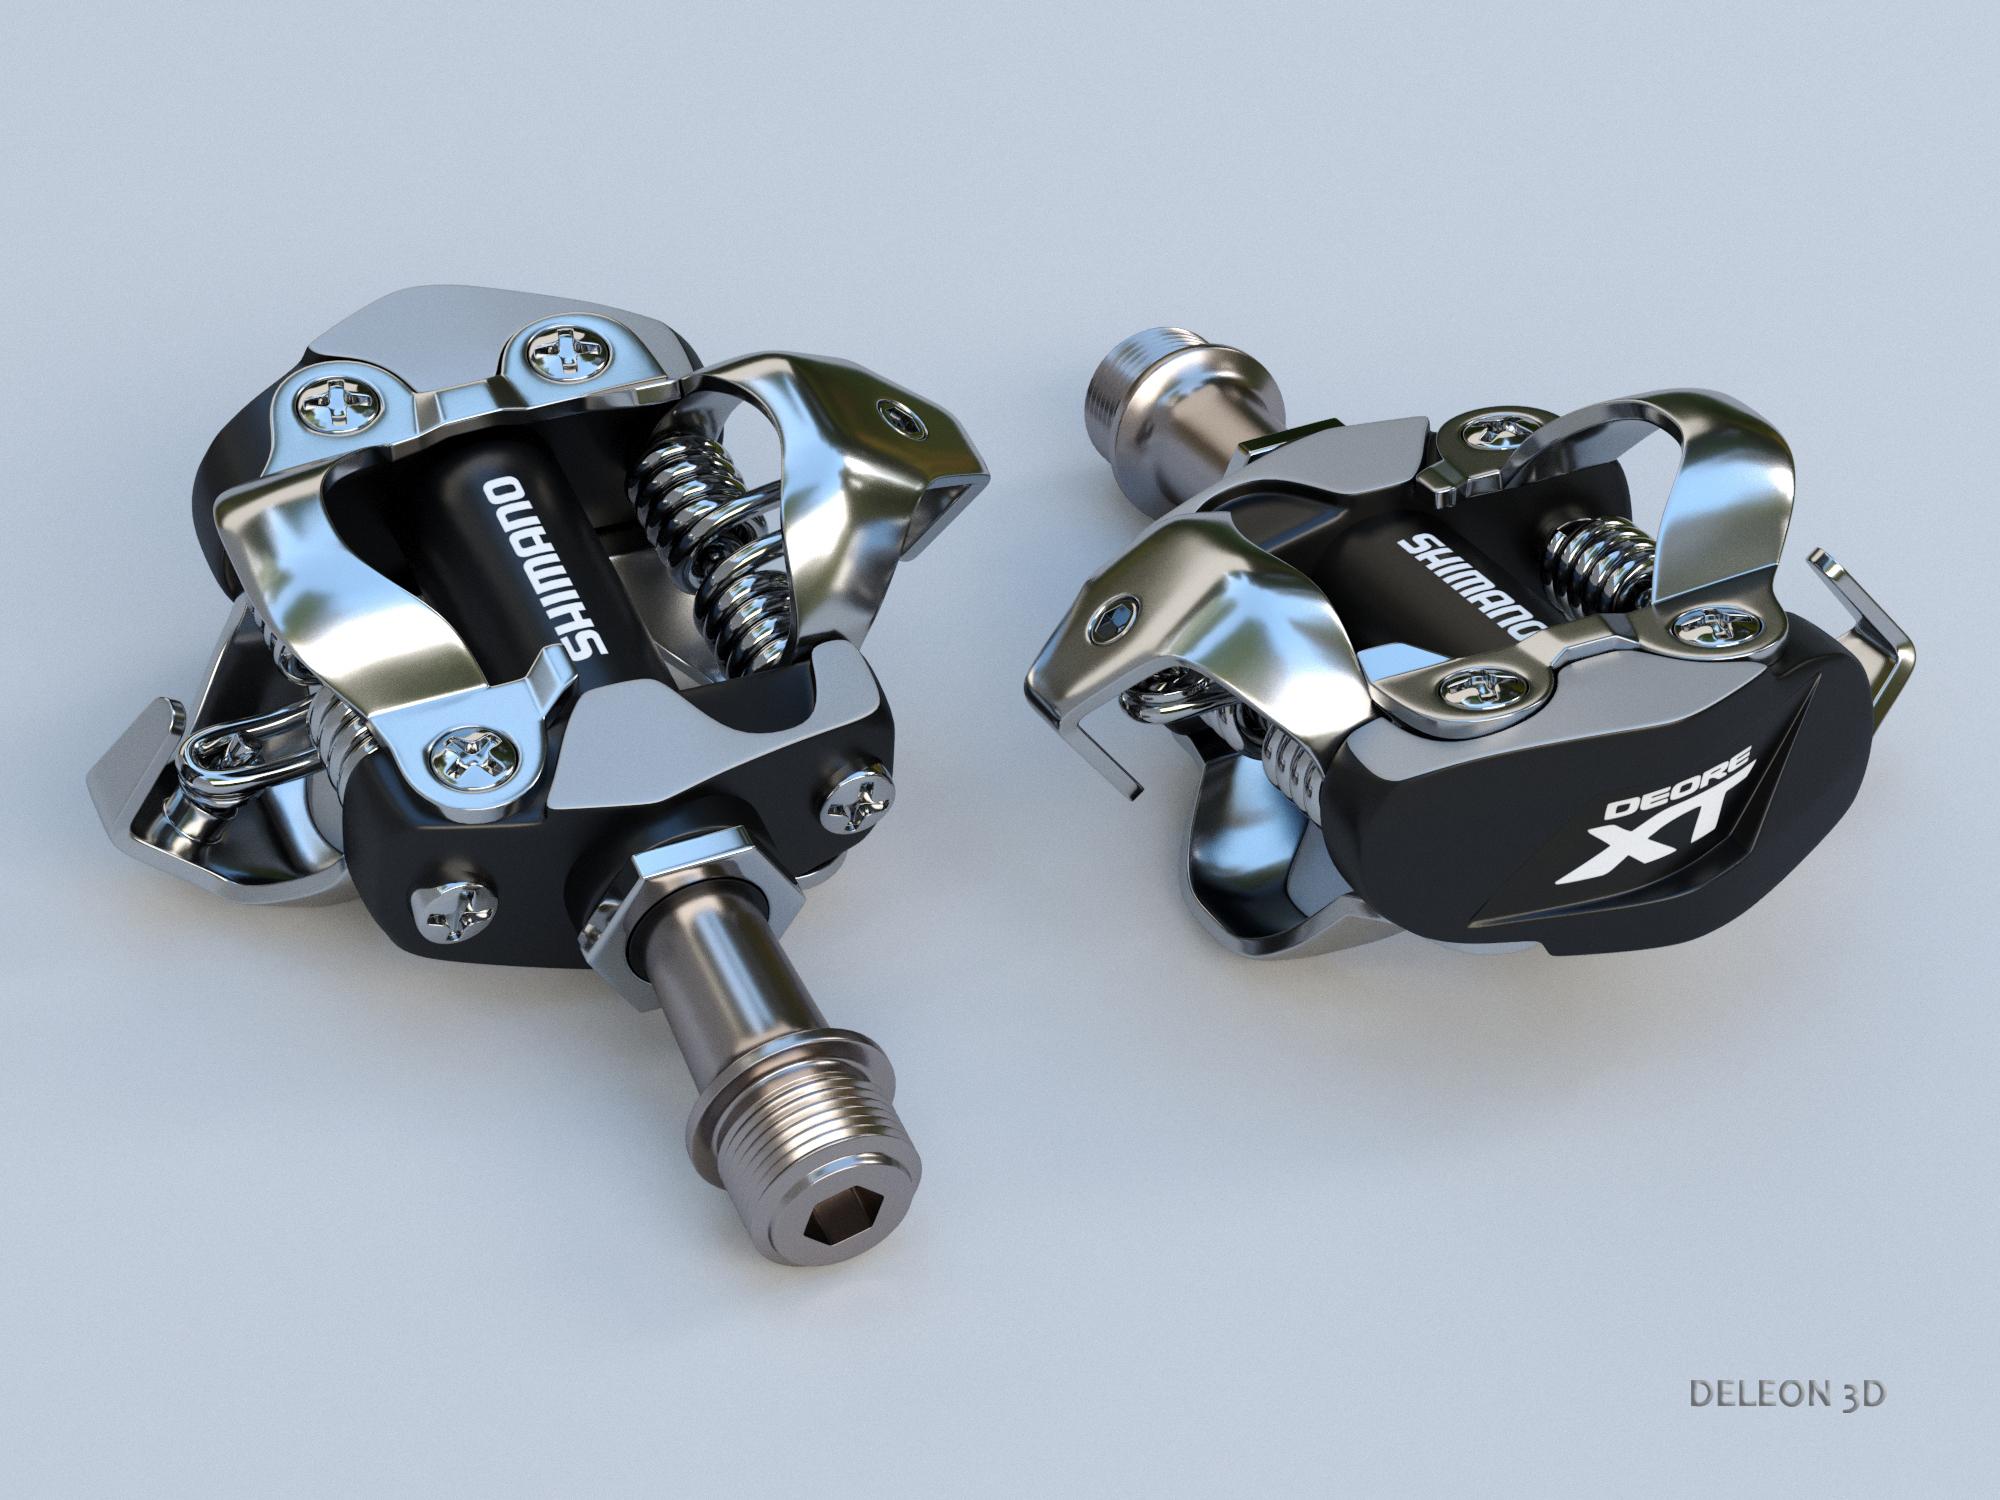 pafta shimano spd pedale 3d model max fbx c4d lxo 279526